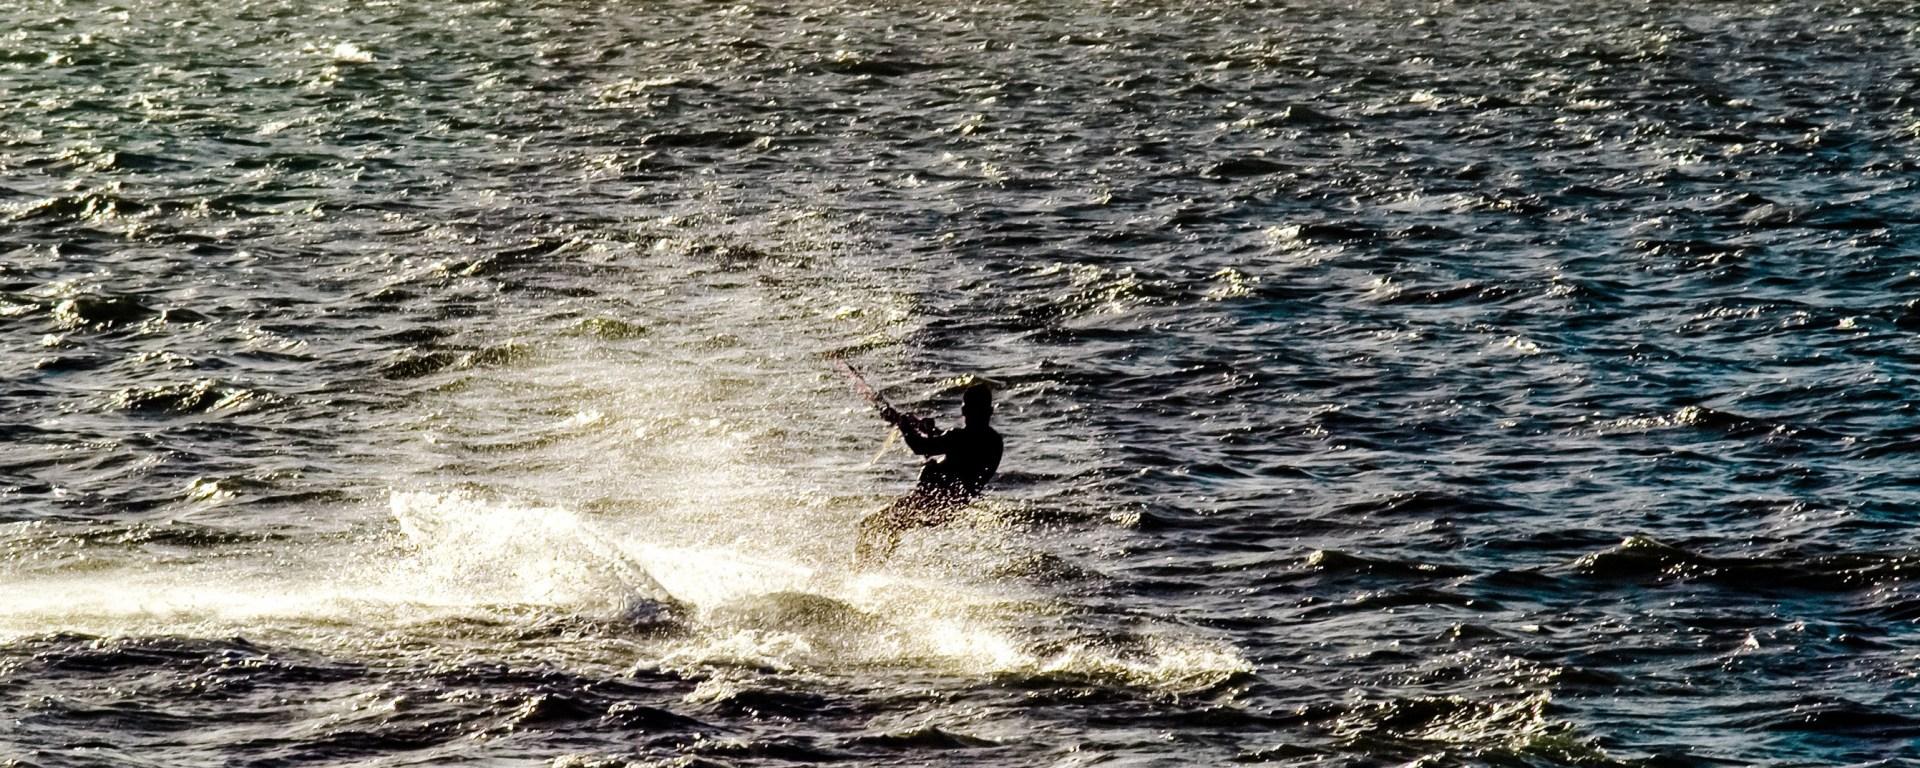 kite-surfing-on-the-solent